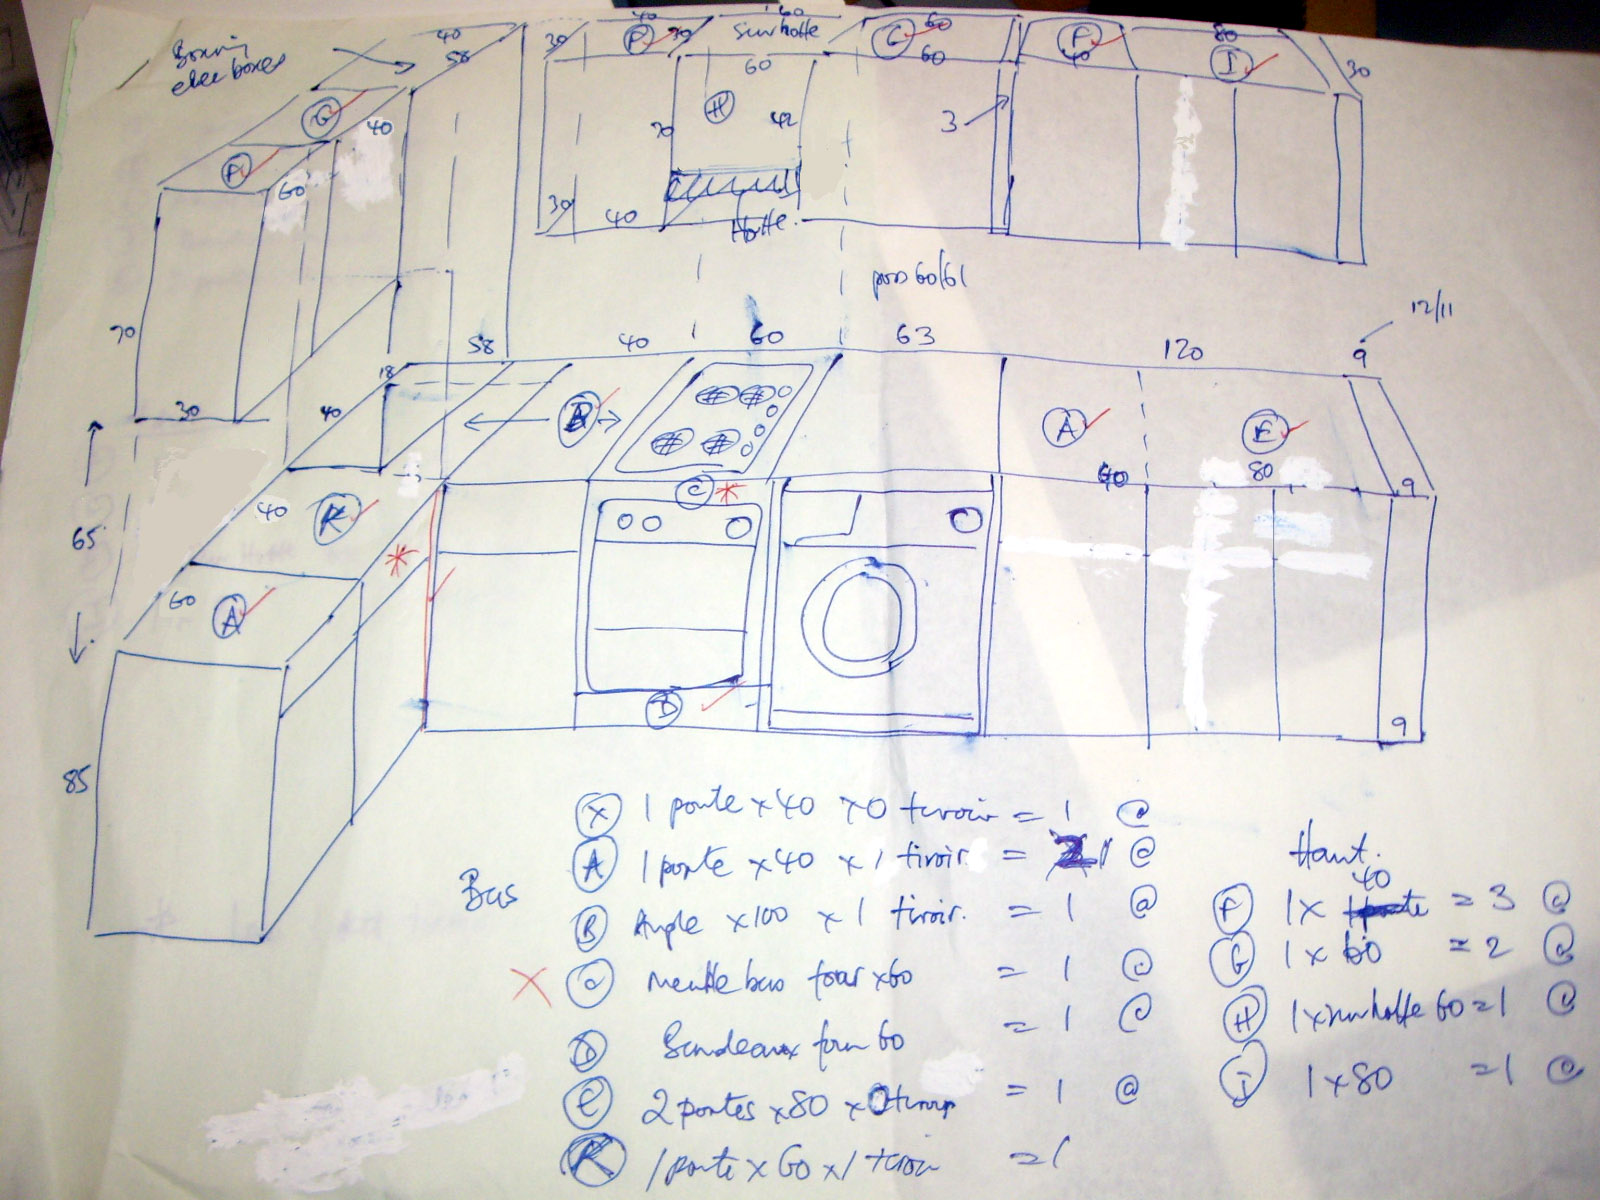 Mh 7645 Code Kitchen Wiring Diagram Electric Wiring Diagram